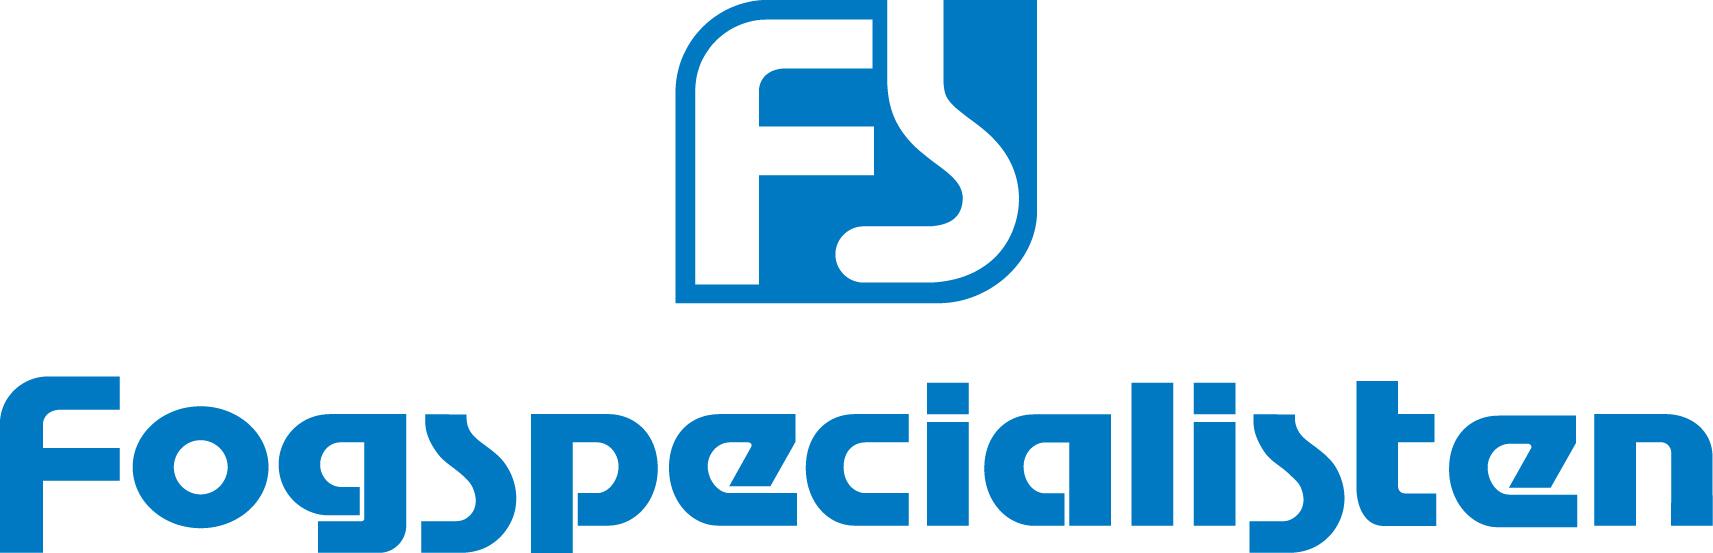 logotyp fogspecialisten ny logo 2011.jpg